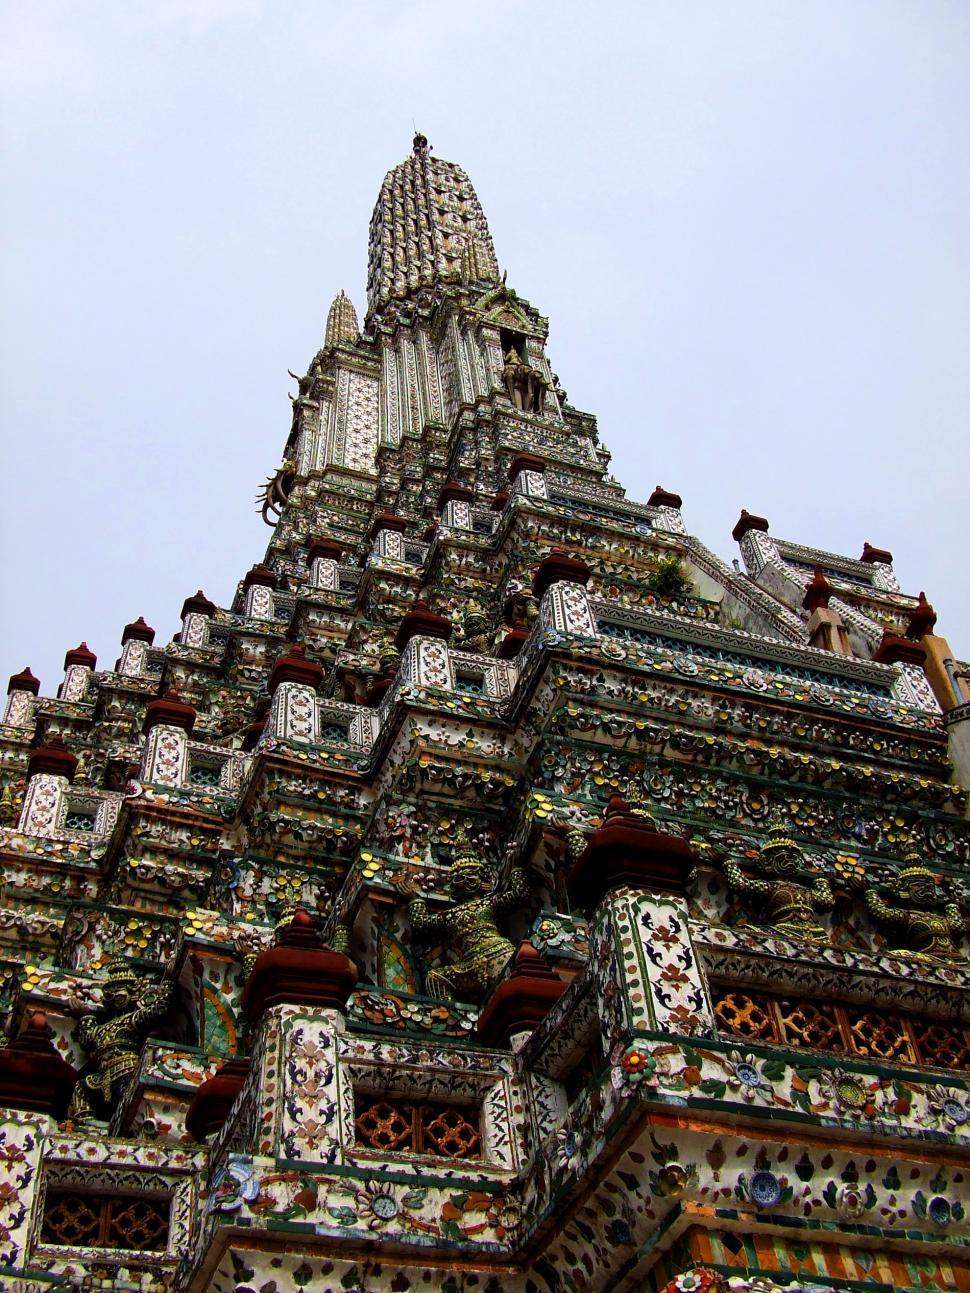 Download Free Stock HD Photo of Wat Arun in Bangkok - Thailand Online